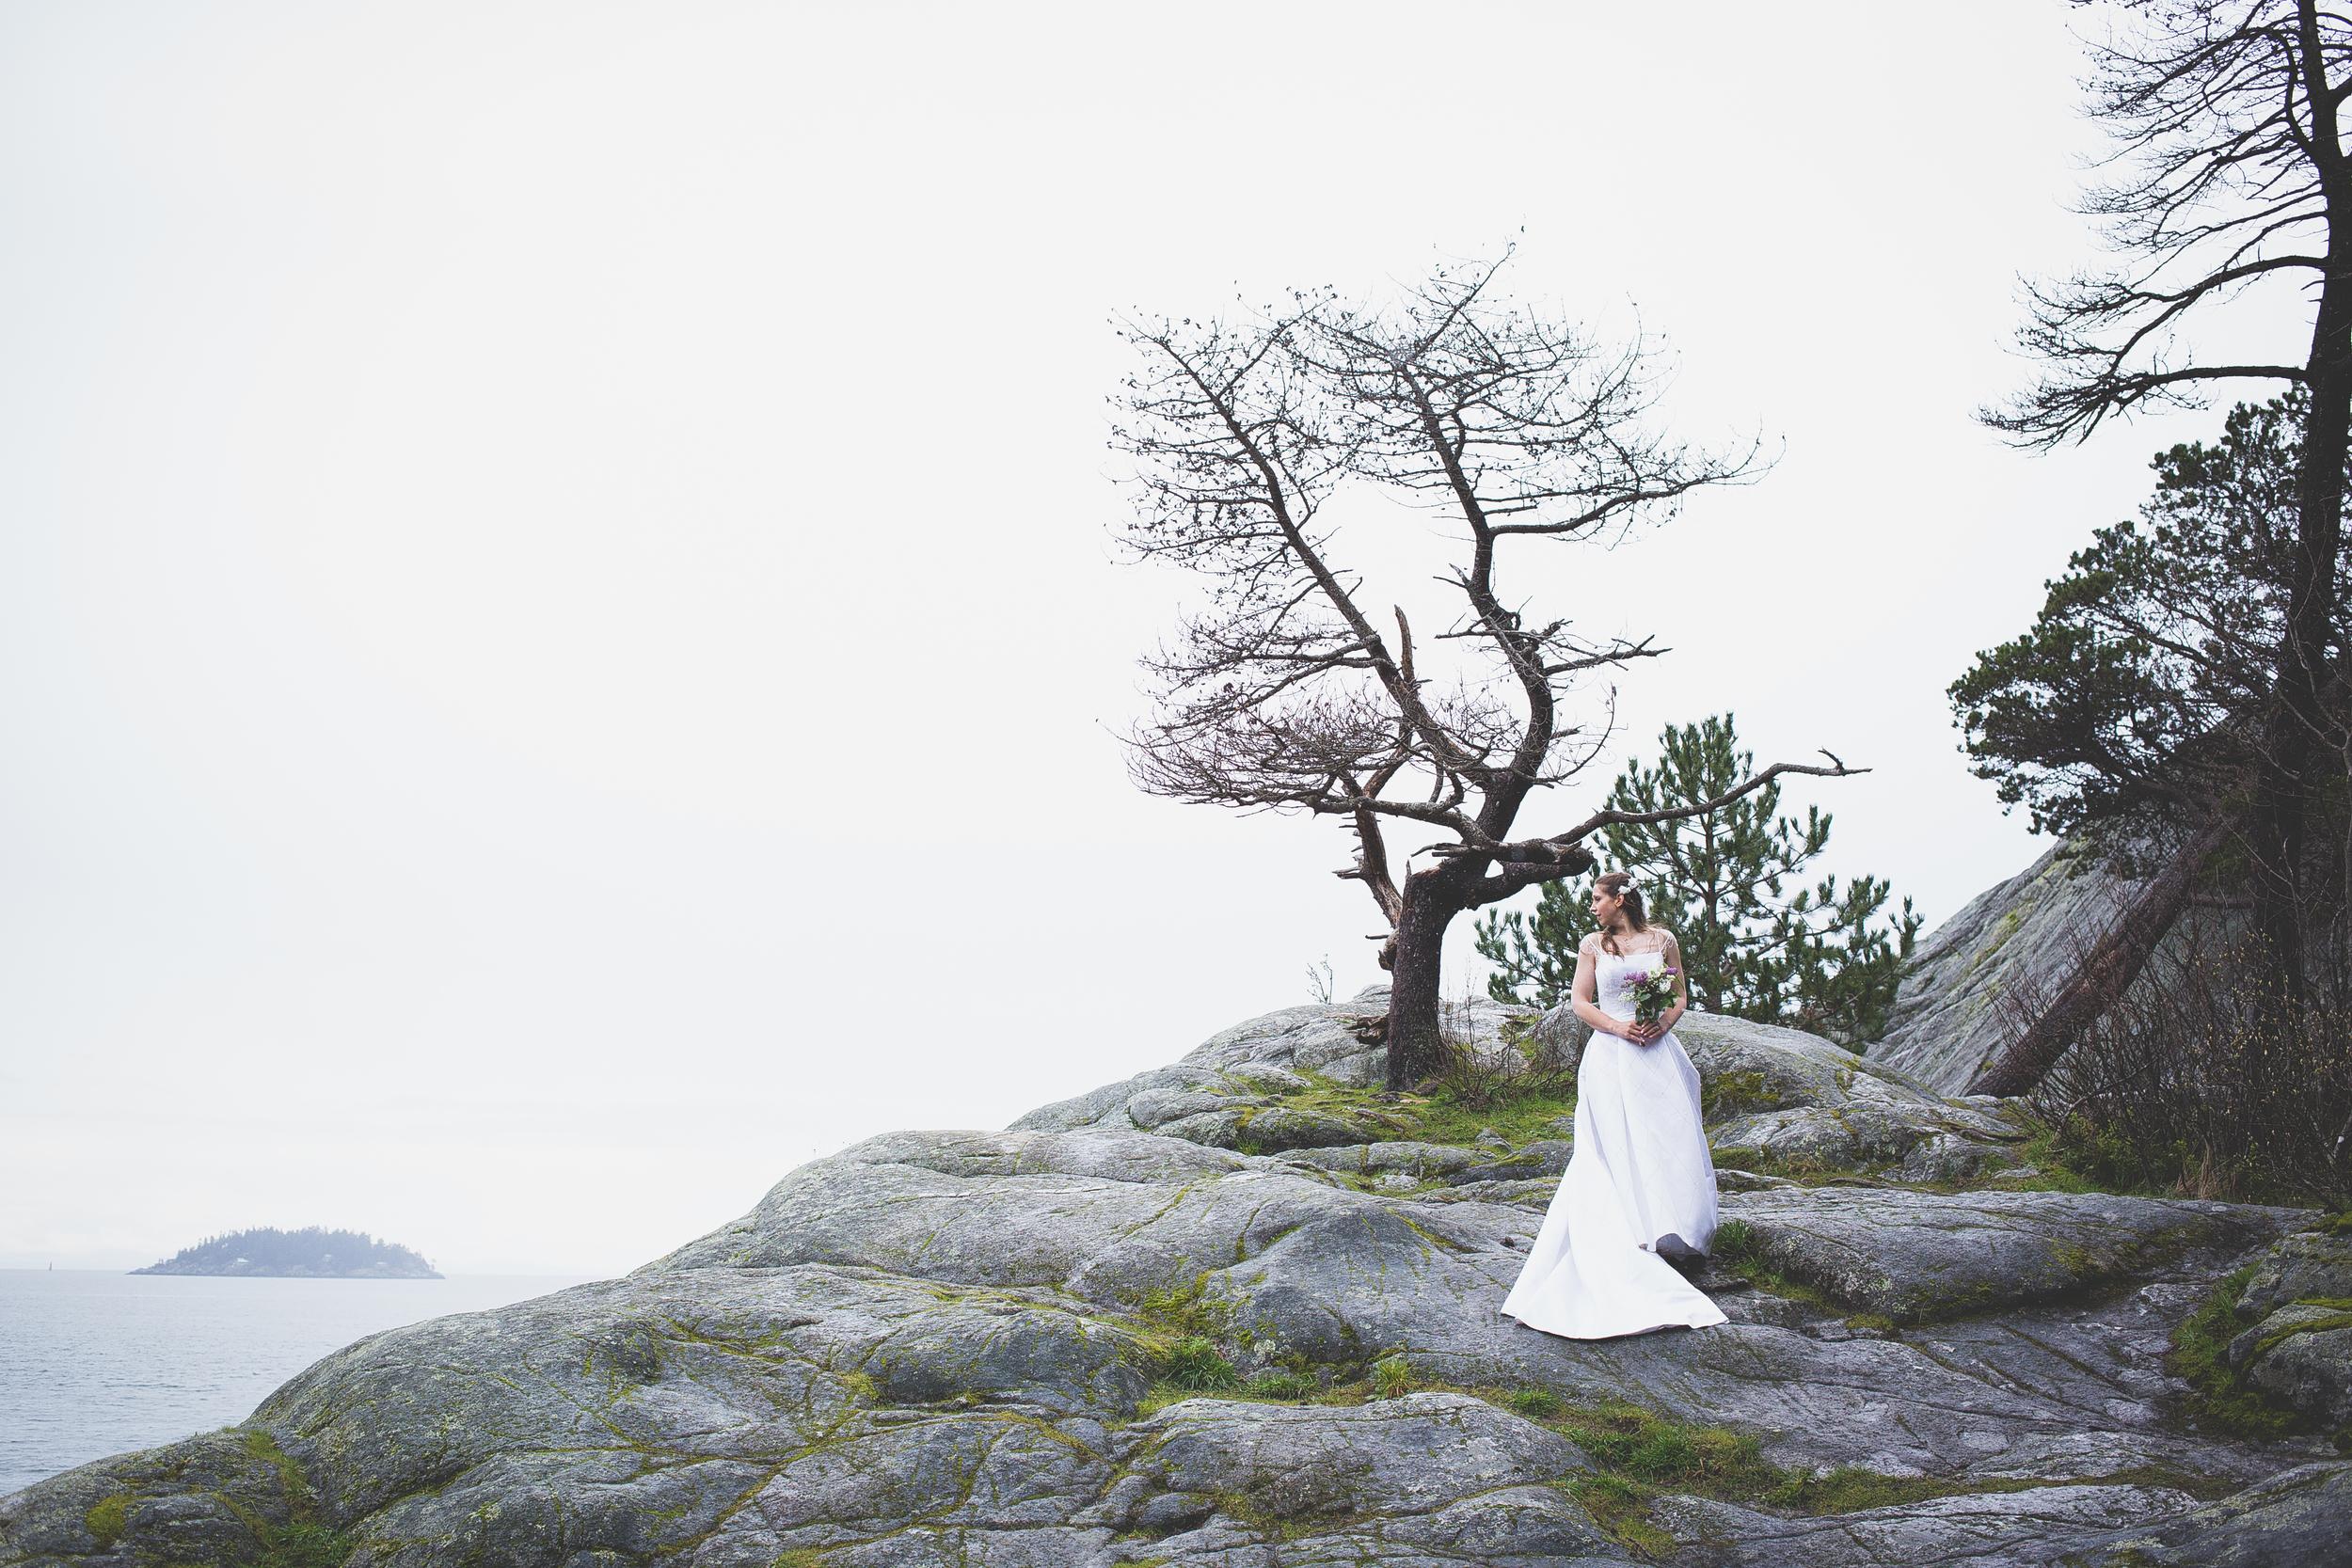 vancouver_photographer_wedding_DogwoodPhotography-11.jpg